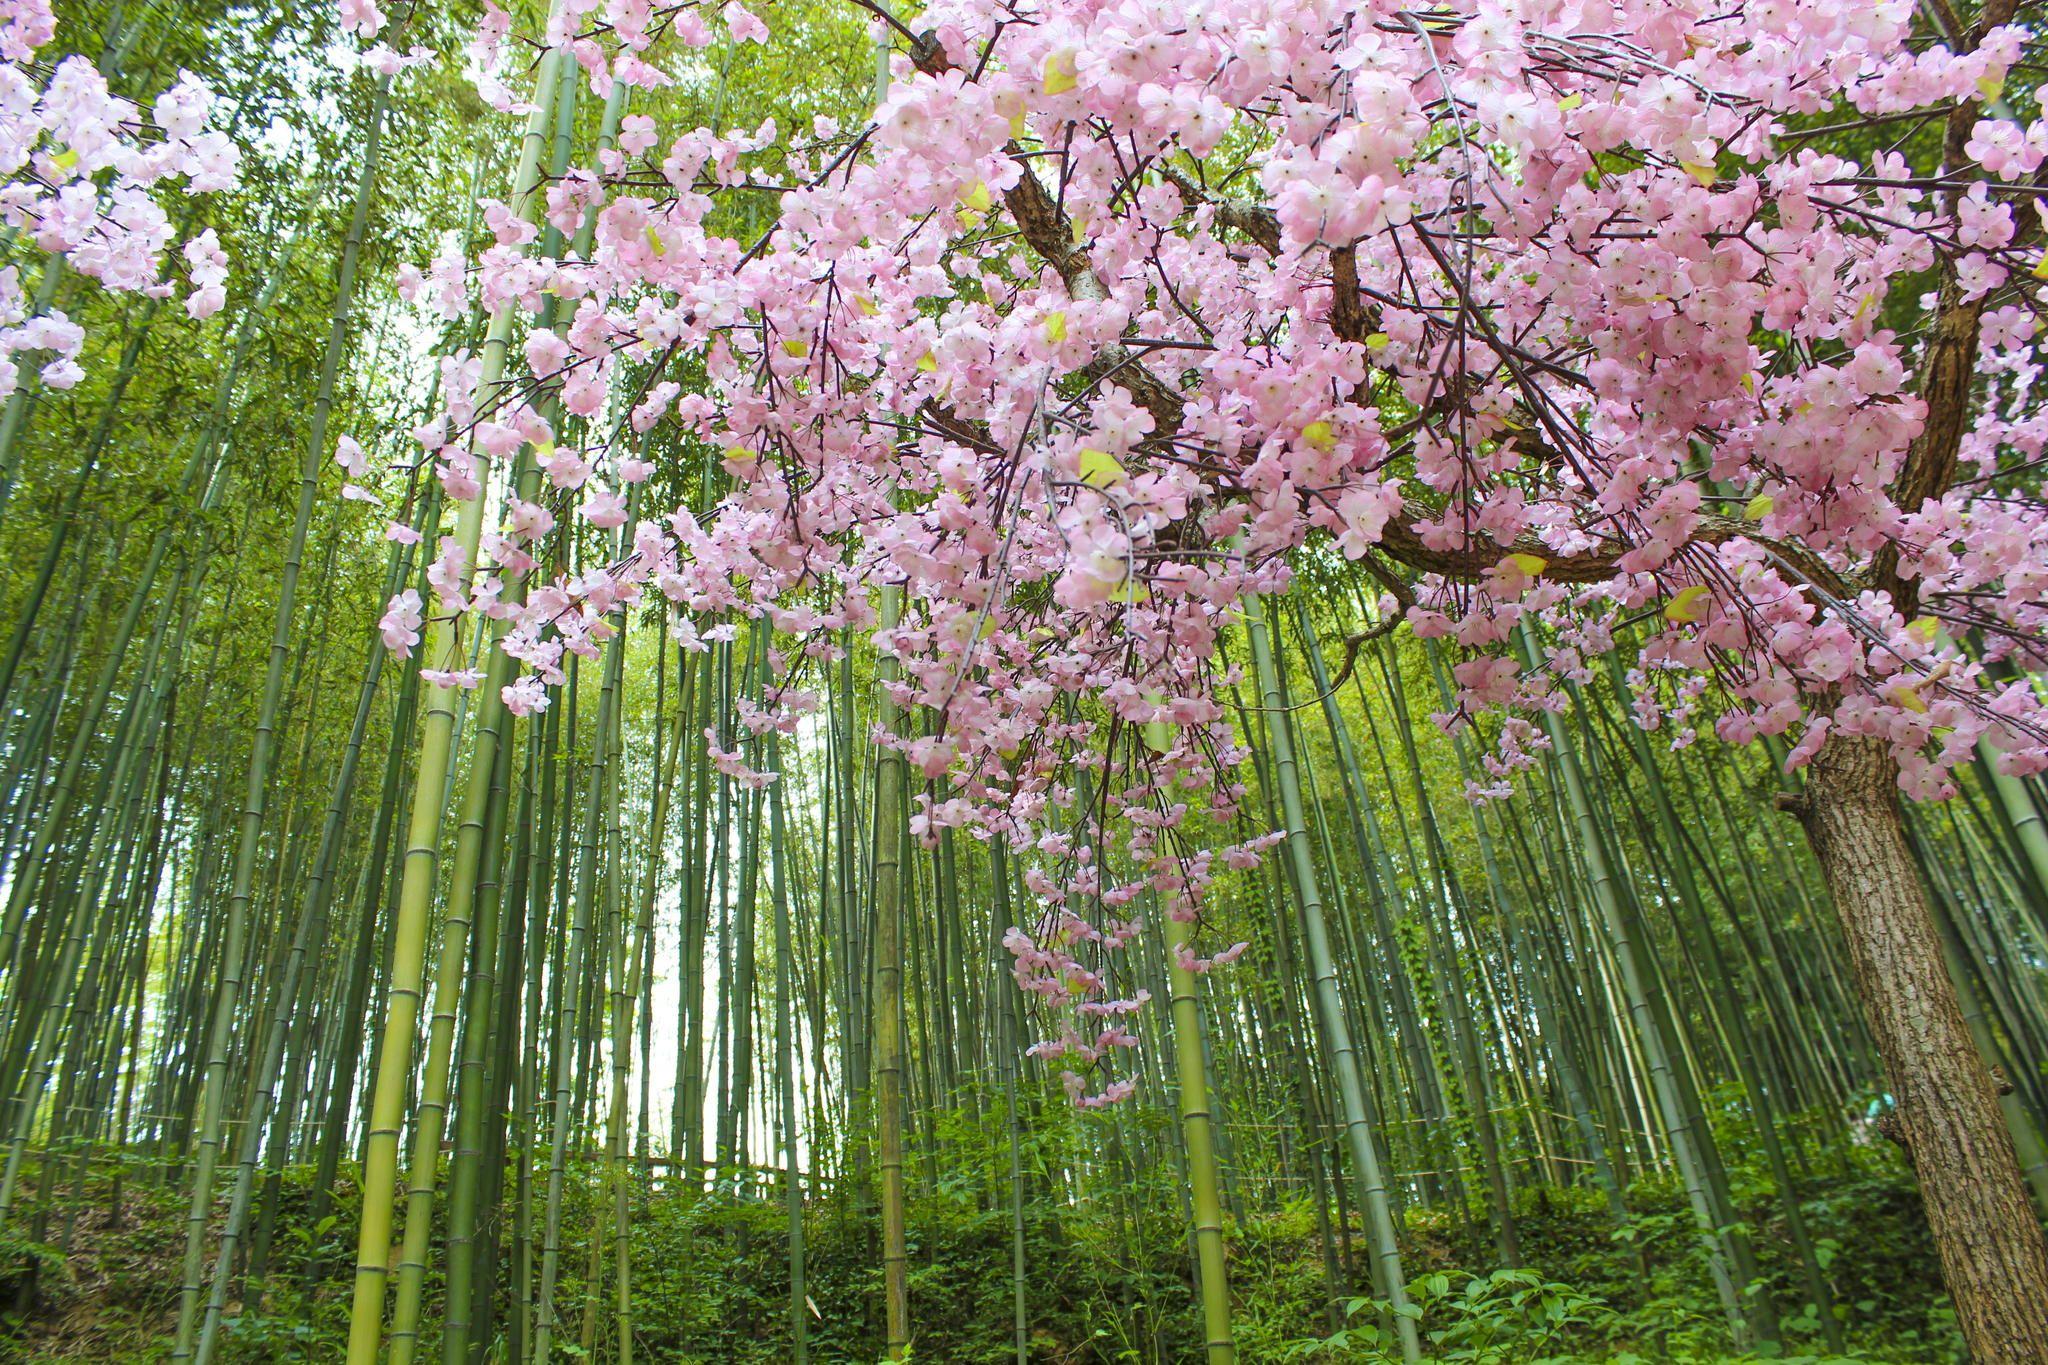 Bamboo Forest Cherry Blossom South Korea Travel Travel Destinations Photography